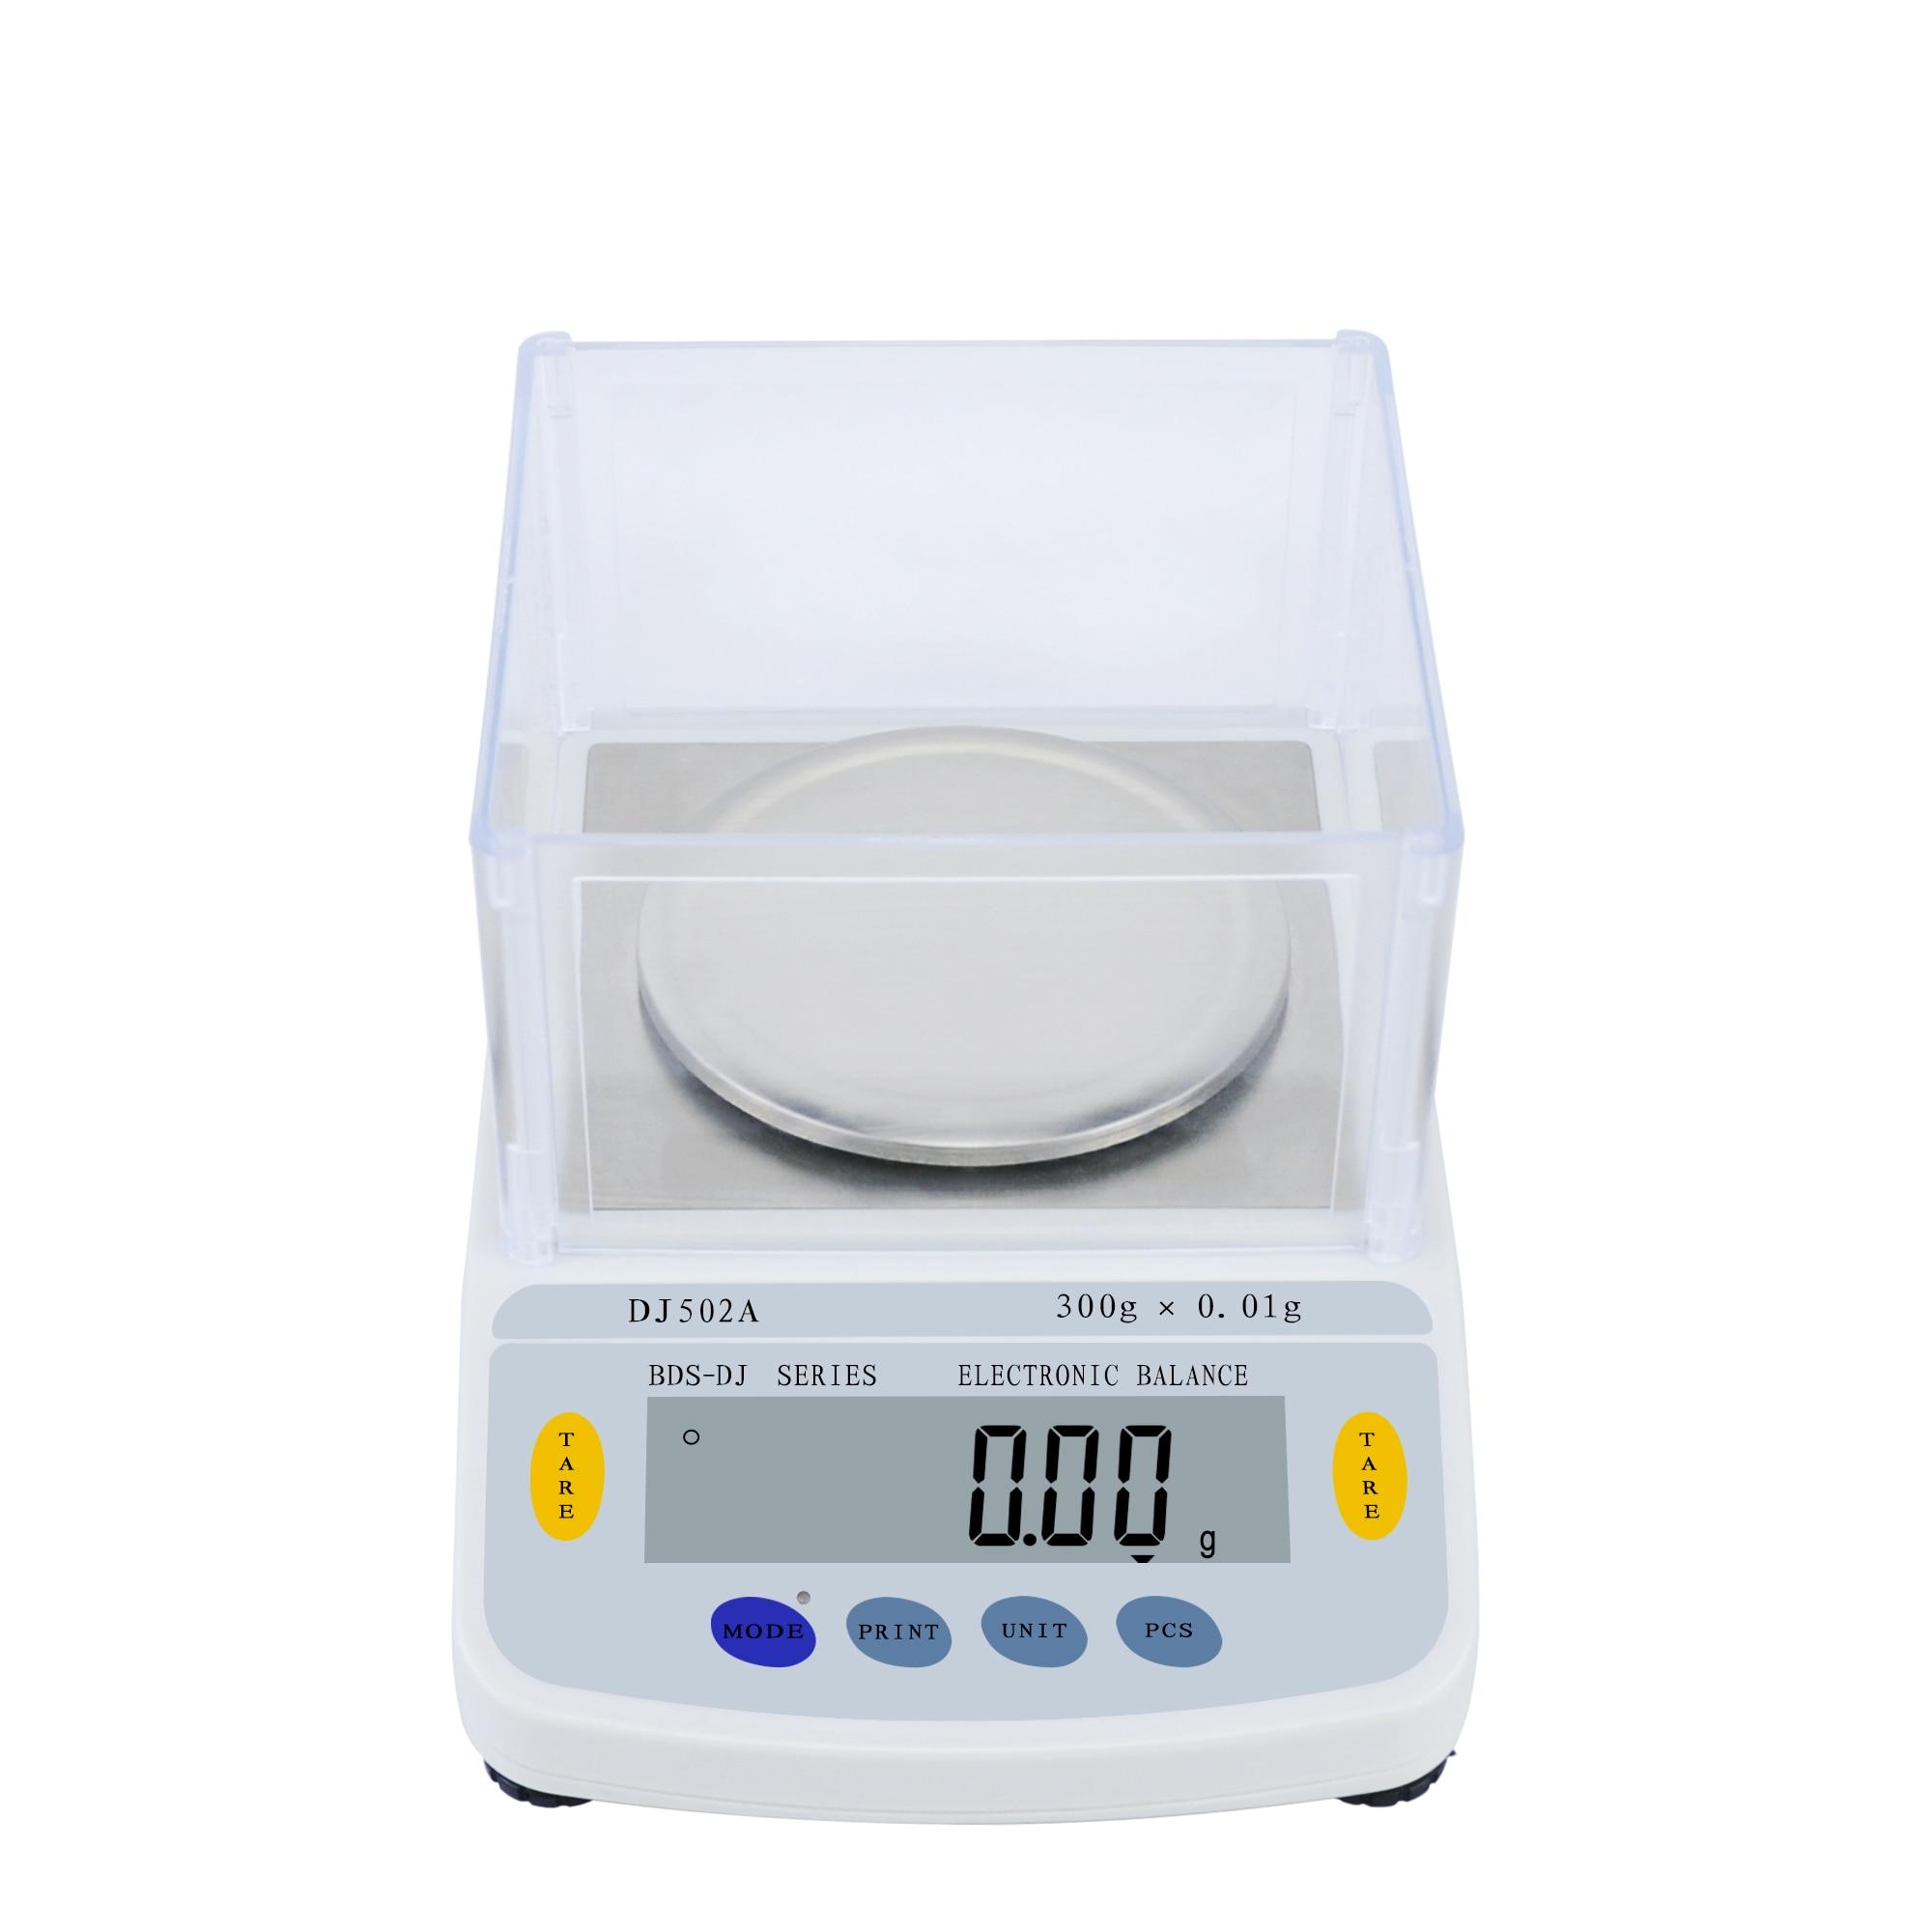 ميزان دقيق إلكتروني رقمي USB ، أمريكي صلب ، 300 جم × 1 مجم 0.01 جم ، ميزان تحليلي للمعمل